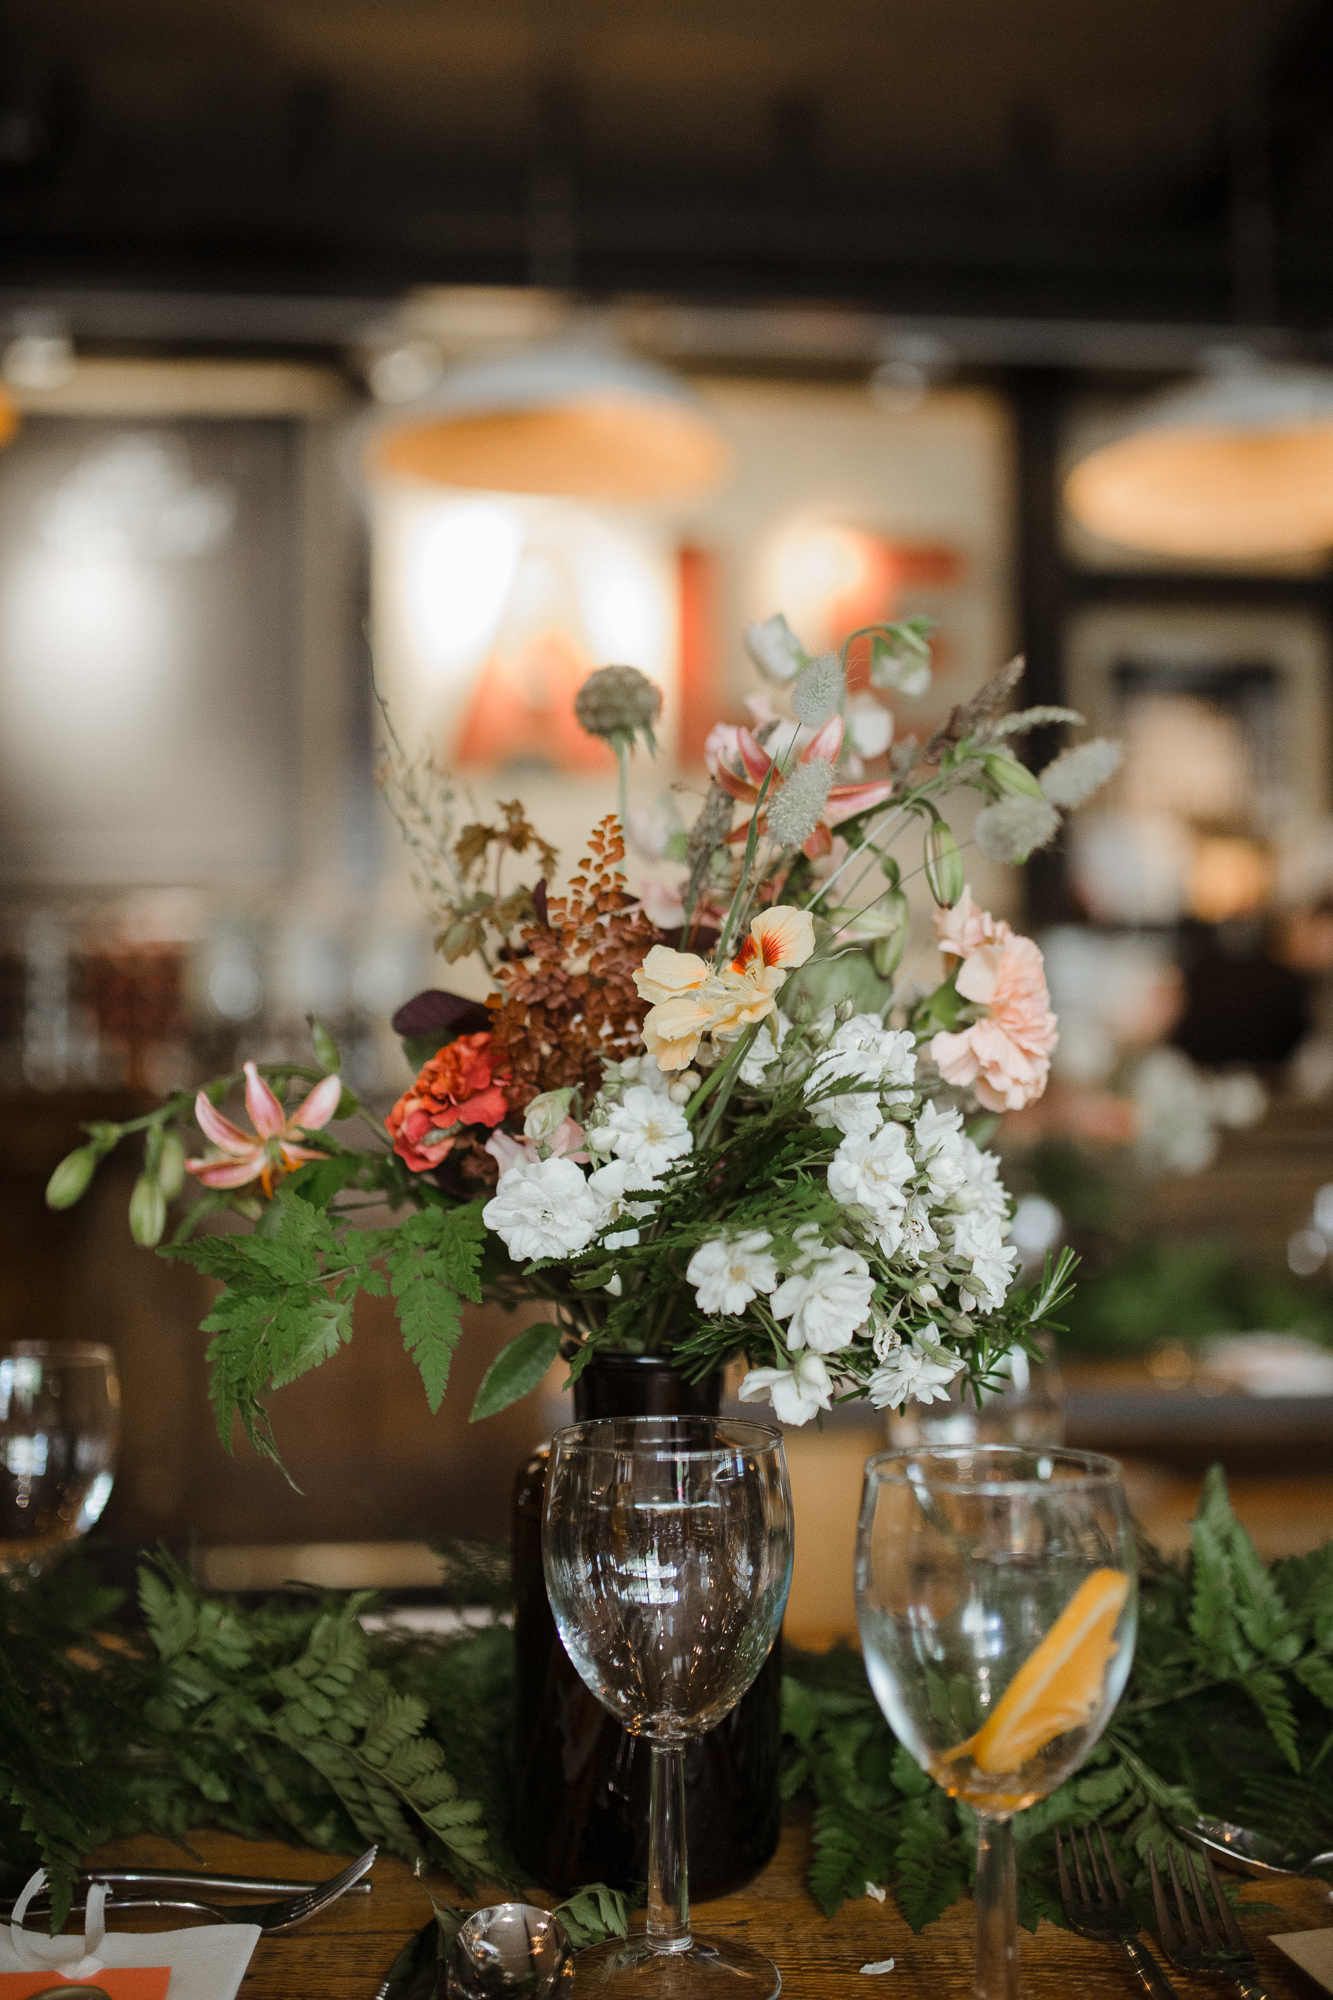 stephanie-green-wedding-photography-sulaflowers-sula-flowers-london-islington-town-hall-depot-n7-98.jpg